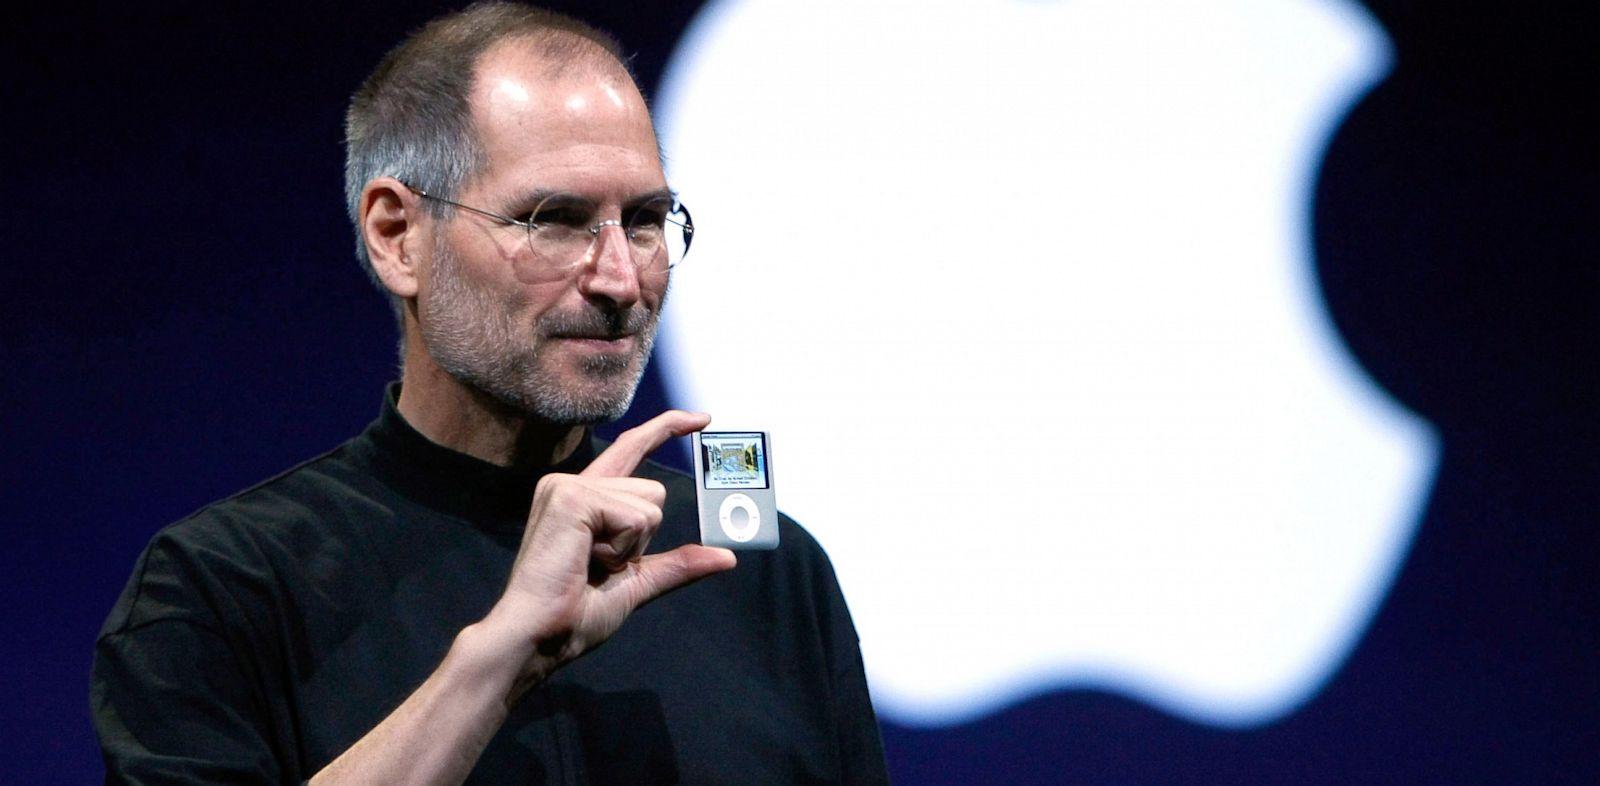 Wozniak: Steve jobs was primarily interested in money